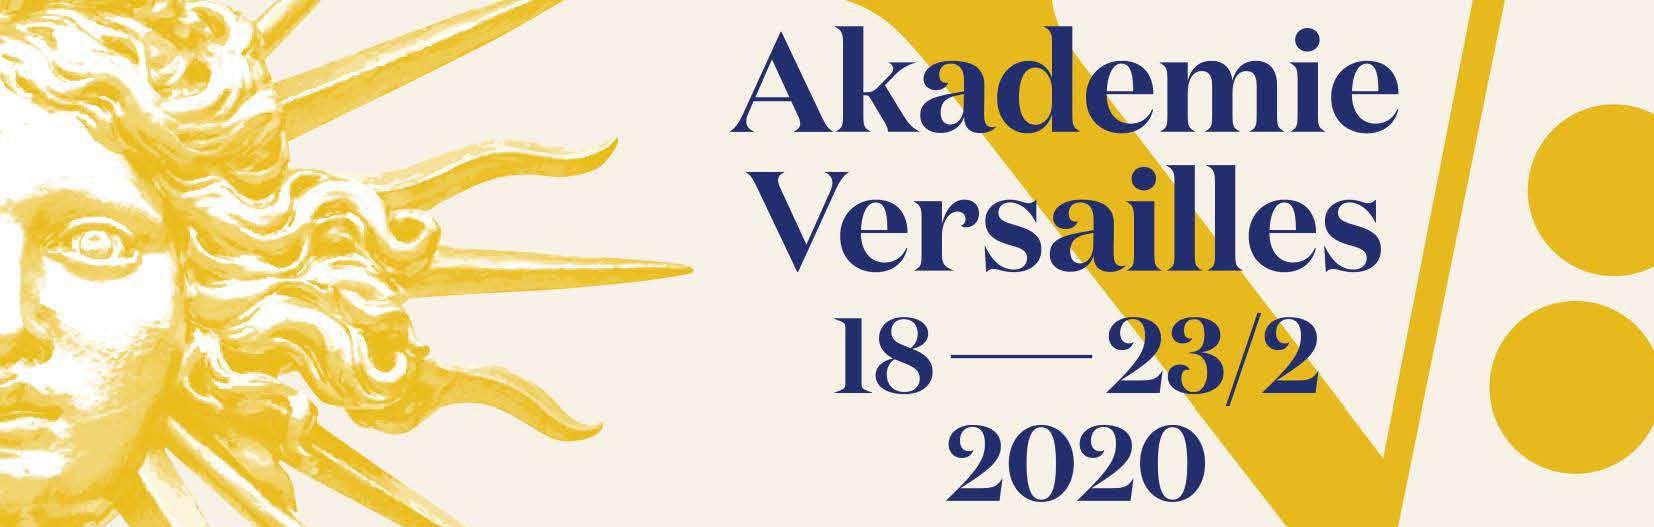 Inscription : Akademie Versailles 2020